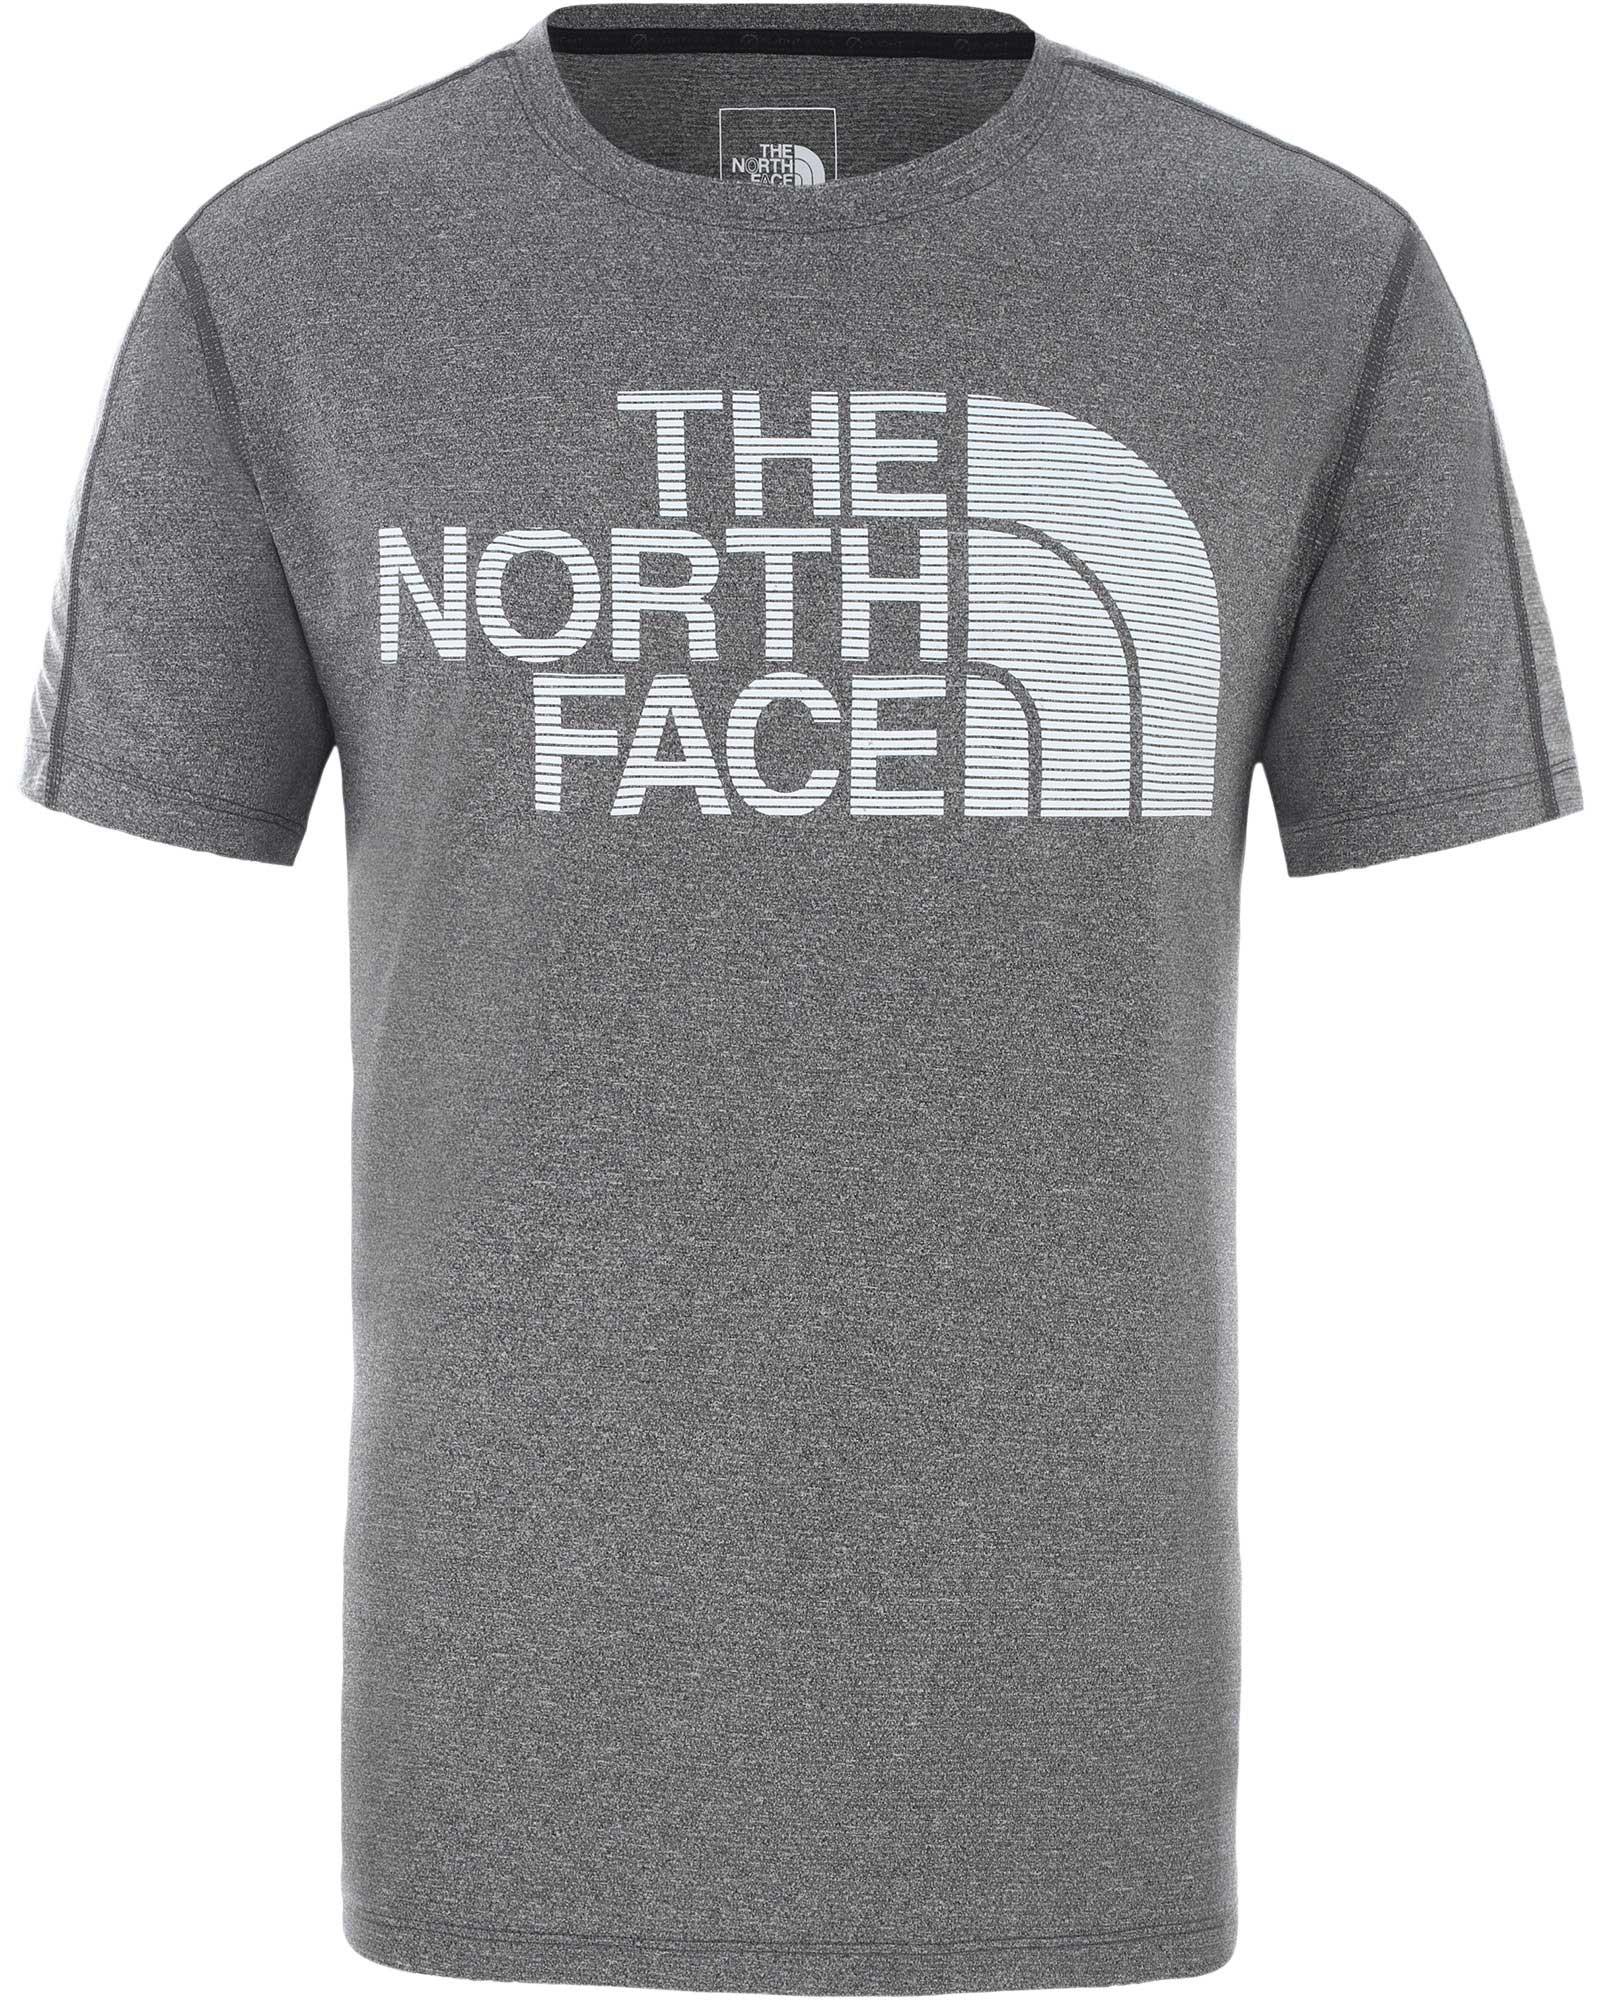 The North Face Mens Gps Hoody Sheffield